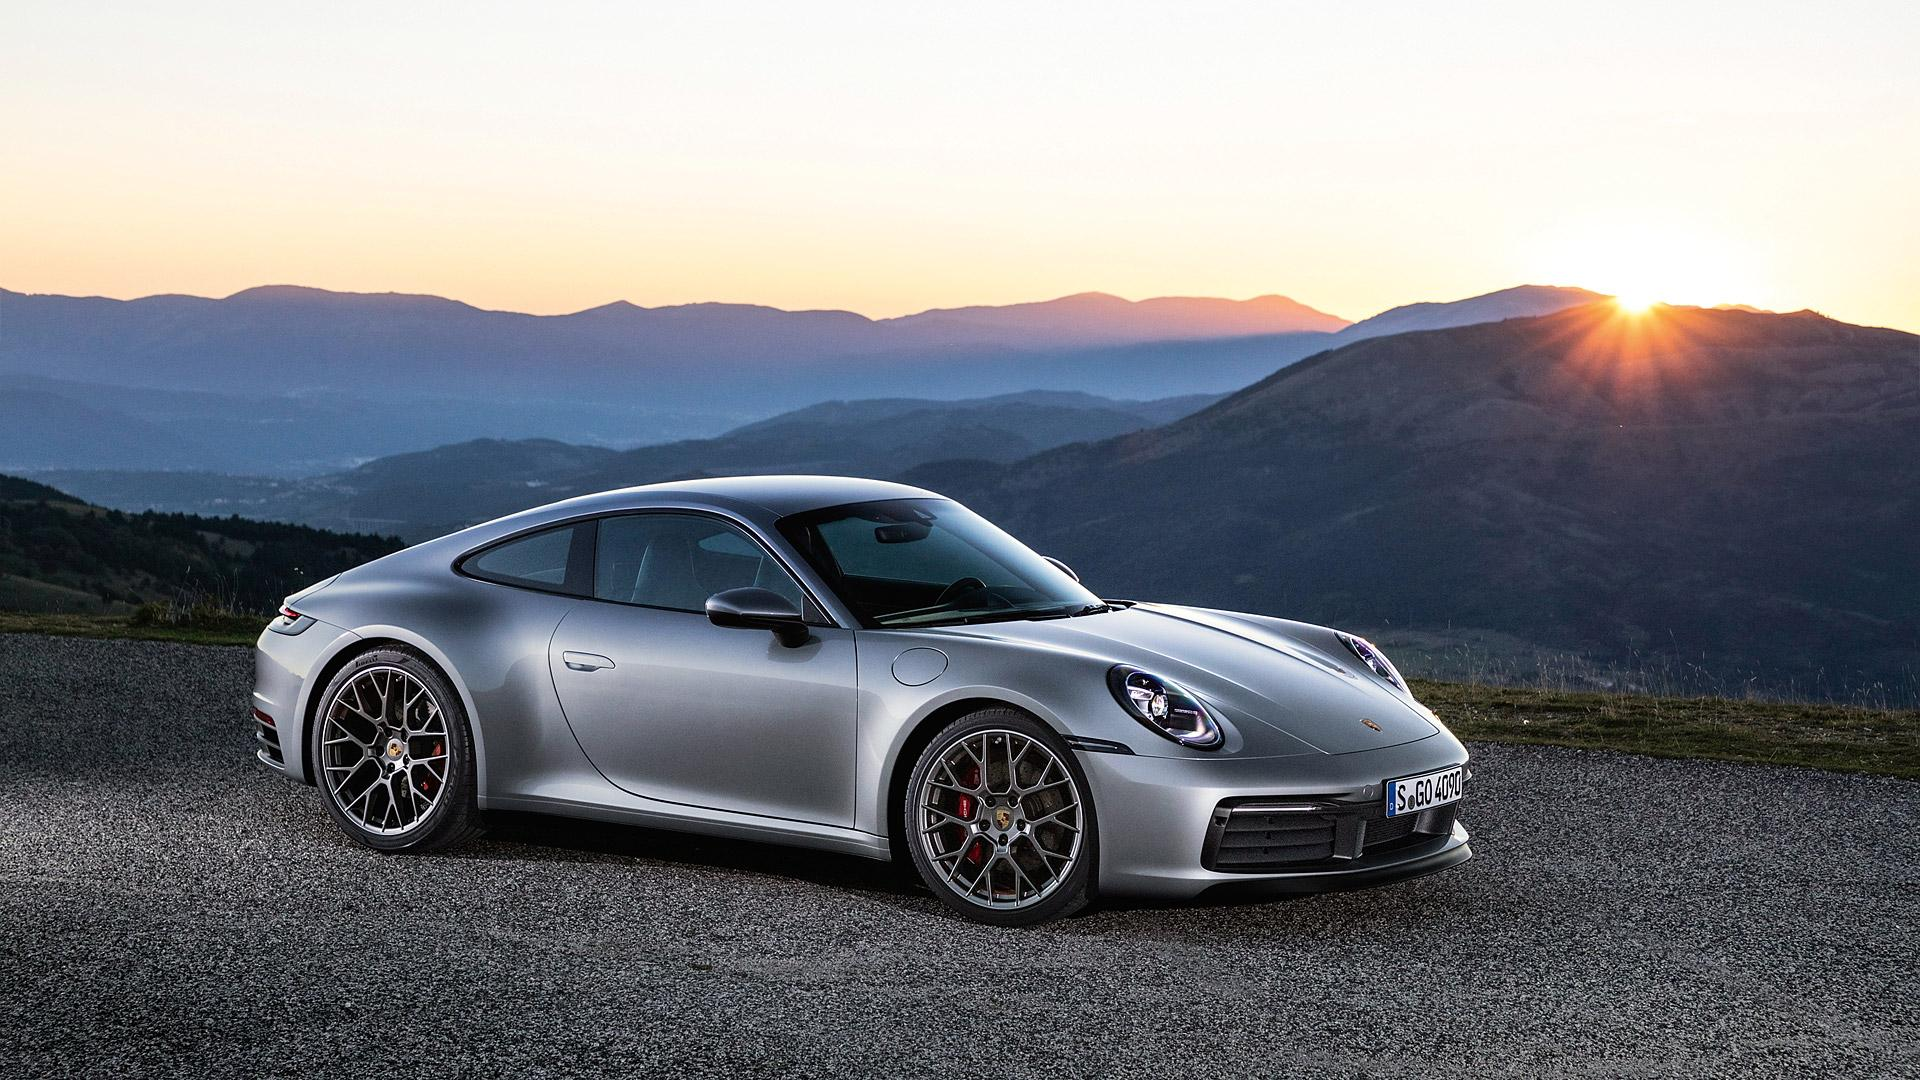 Porsche 911 Cabriolet Wallpapers